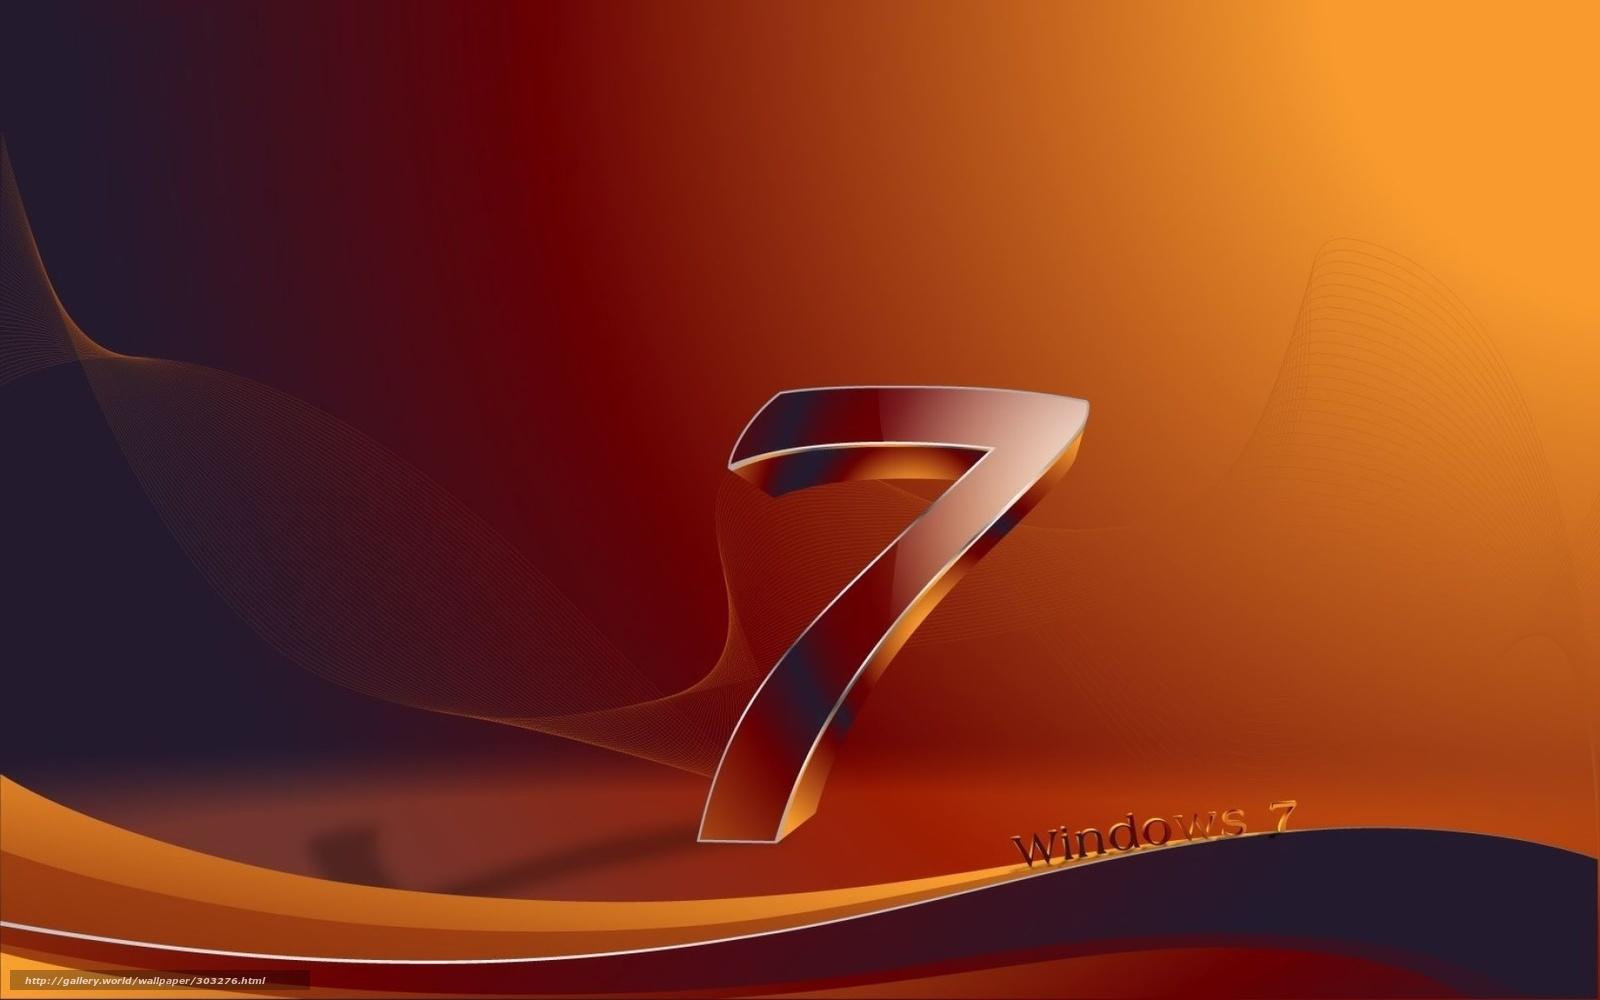 tlcharger fond d 39 ecran fentres 7 noir orange fonds d. Black Bedroom Furniture Sets. Home Design Ideas